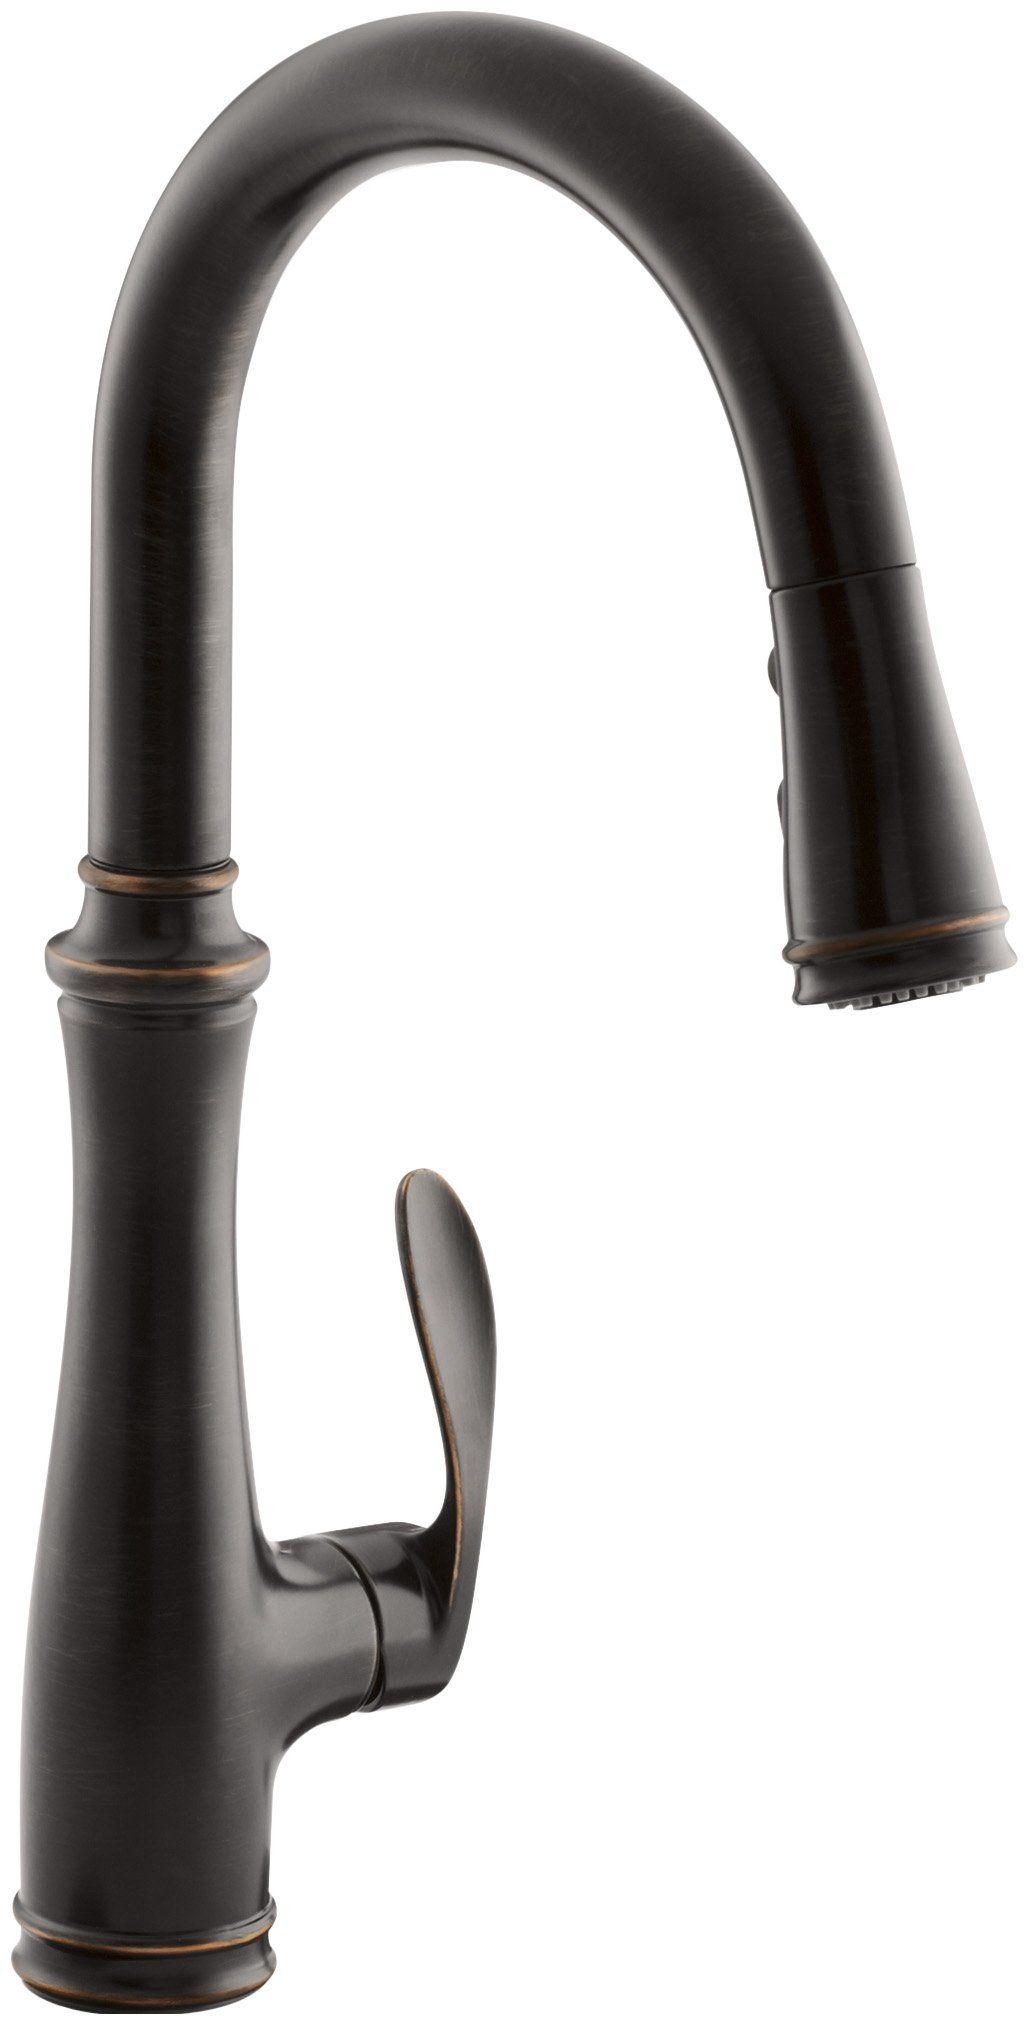 Kohler K560VS Bellera PullDown Kitchen Faucet, Vibrant